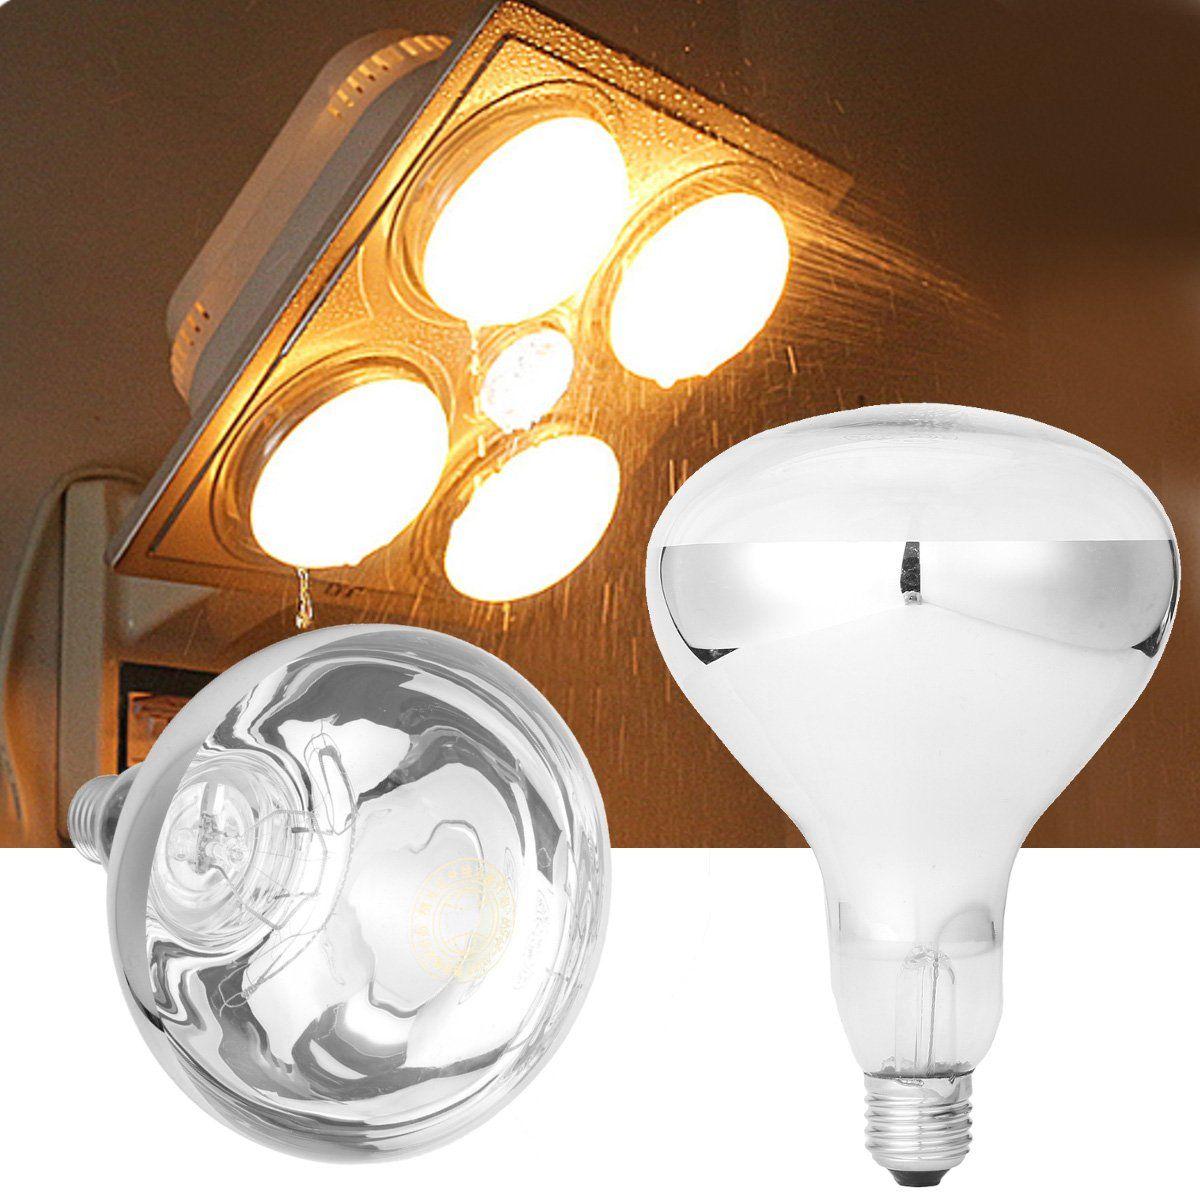 E27 275w Infrared Heat Bulb For Ceiling Exhaust Fan Bathroom Heater Ac220v Bathroom Heater